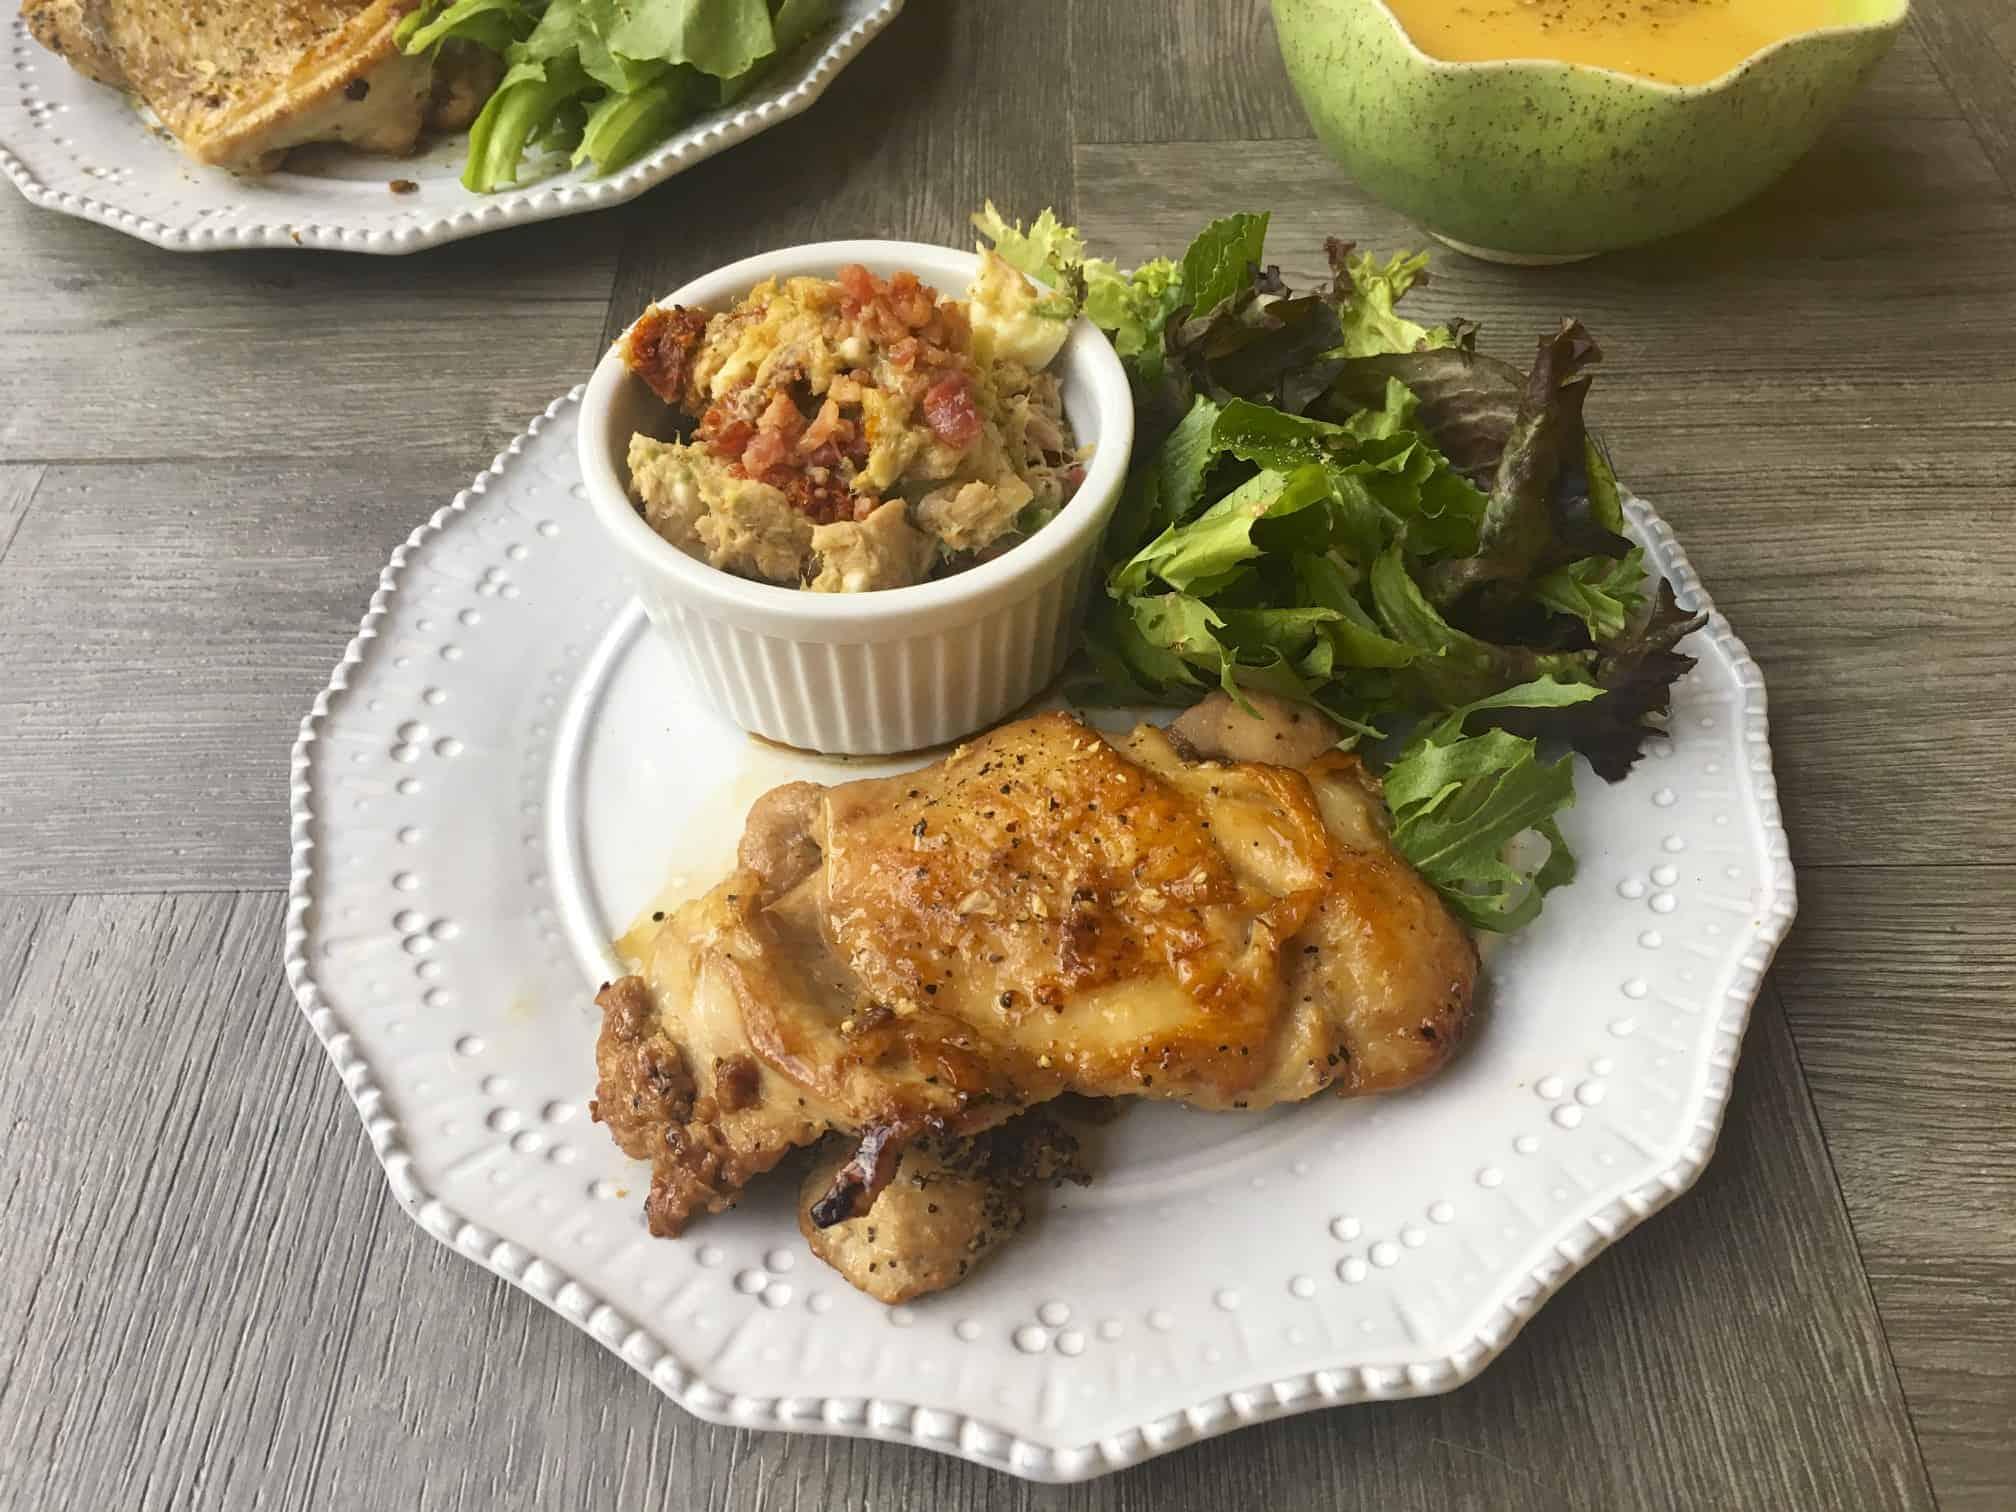 無糖版照燒雞腿排 Sugar Free Teriyaki Chicken &自製無糖照燒醬